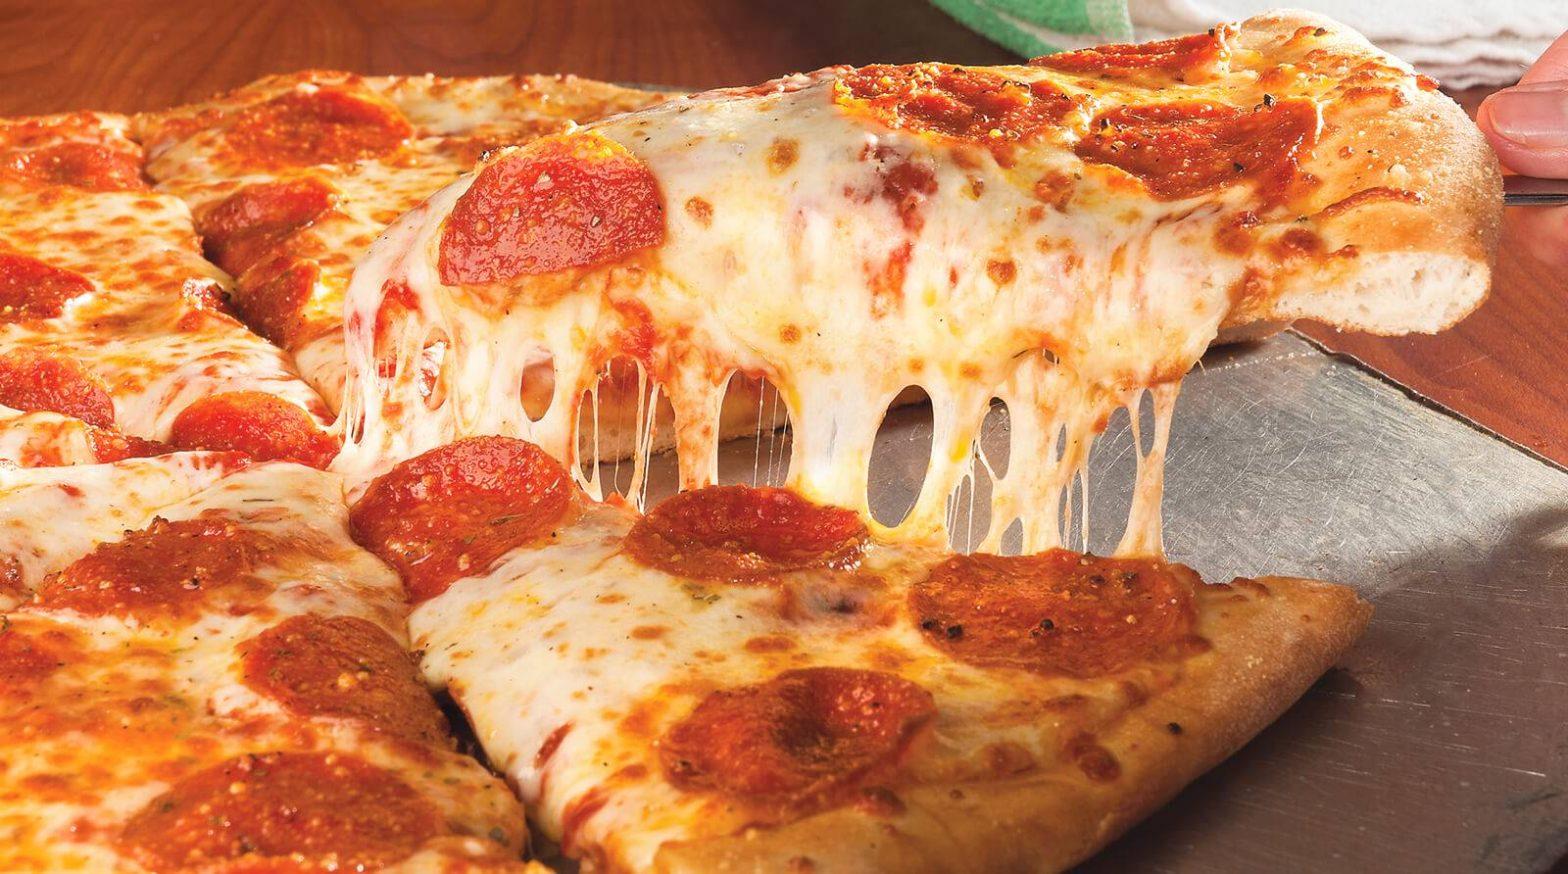 Top Pizza spots in Orlando 2021